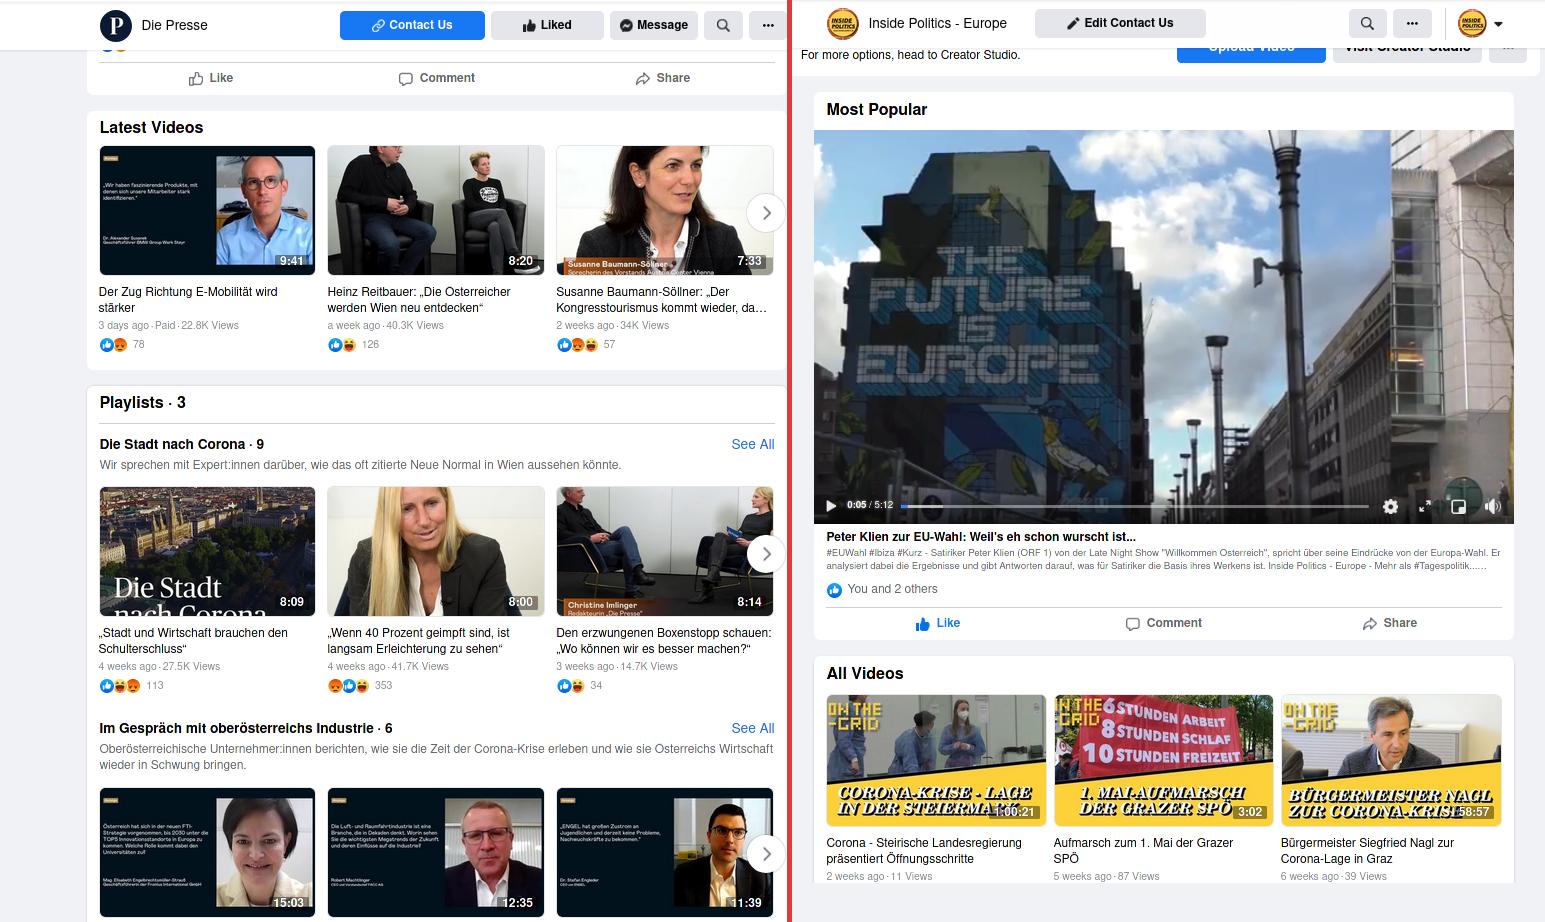 Facebook-Vergleich-Presse- Inside Politics Europe-Facebook Seiten-Web-Social Media